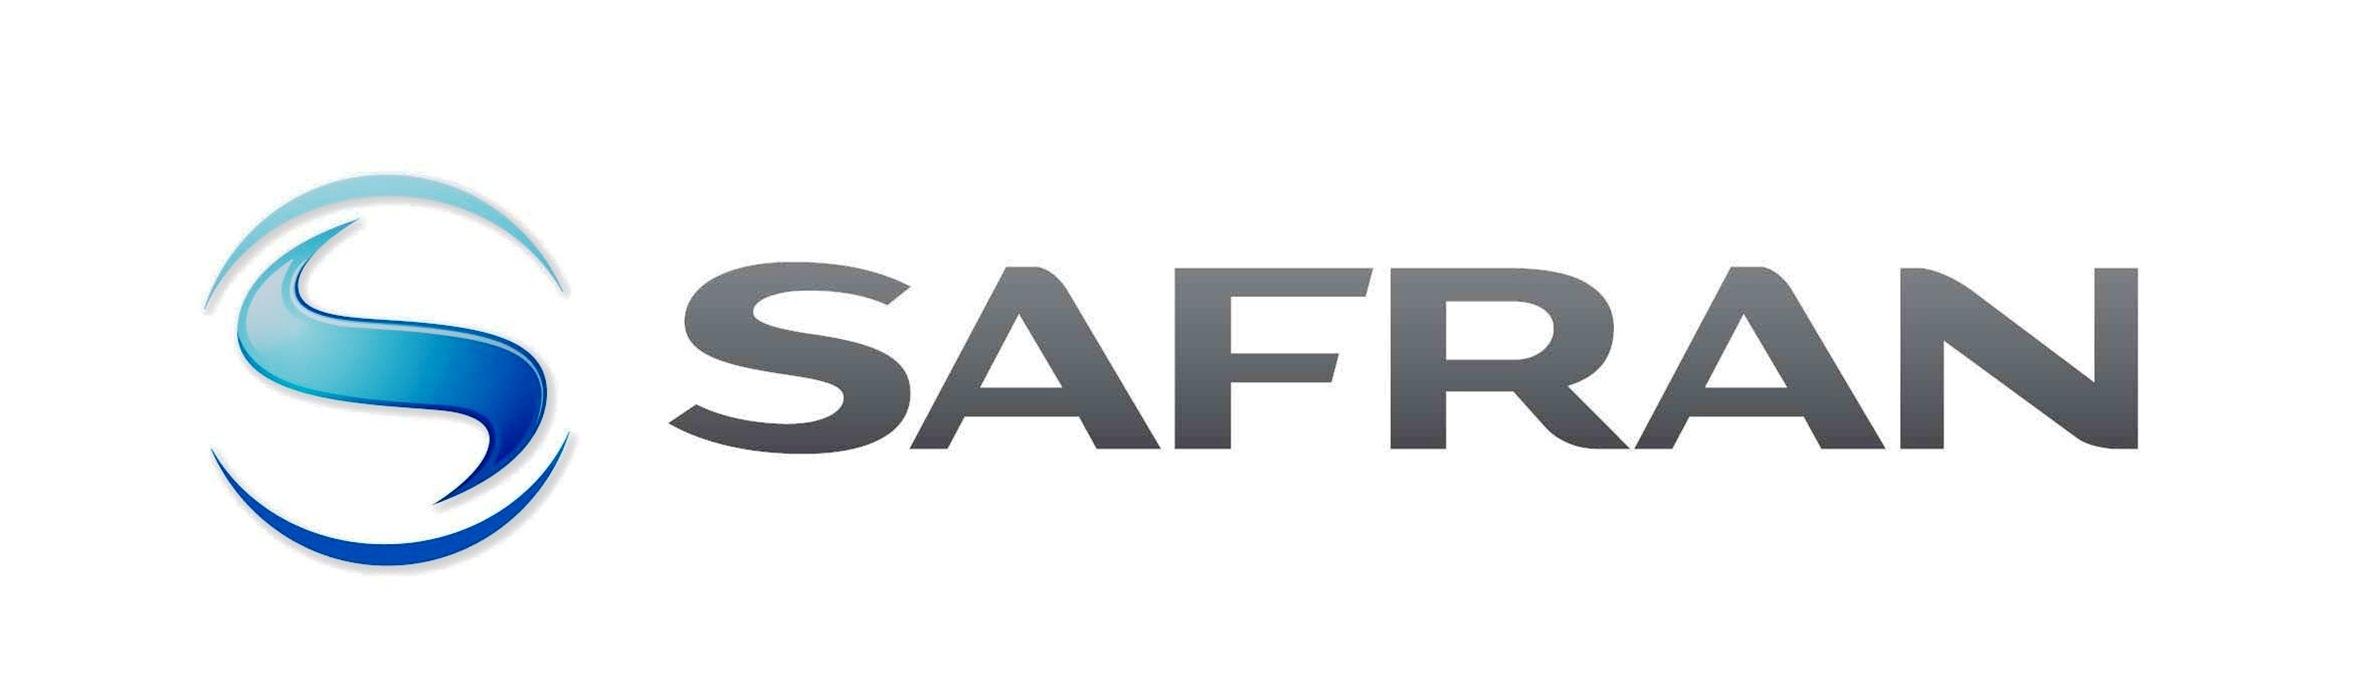 safran-logo.jpg